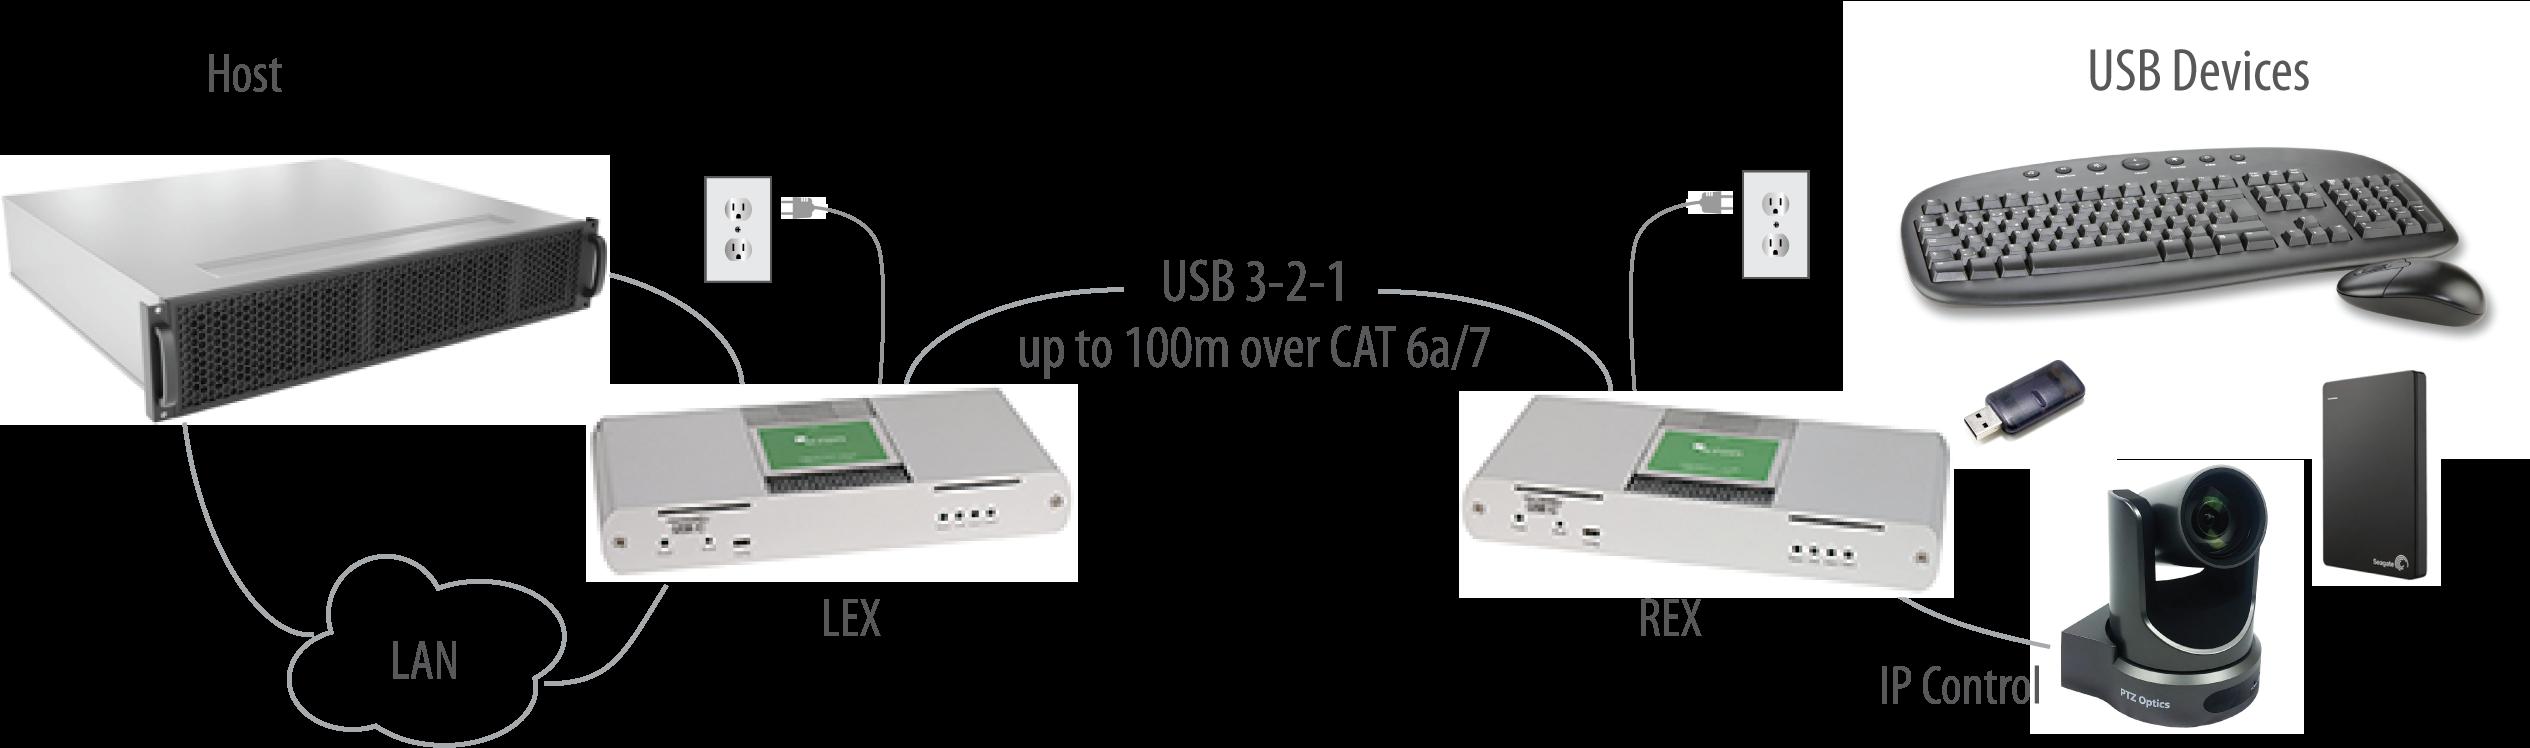 4-port USB 3 1 extender 100m CAT 6a/7 - USB 3-2-1 Raven 3104